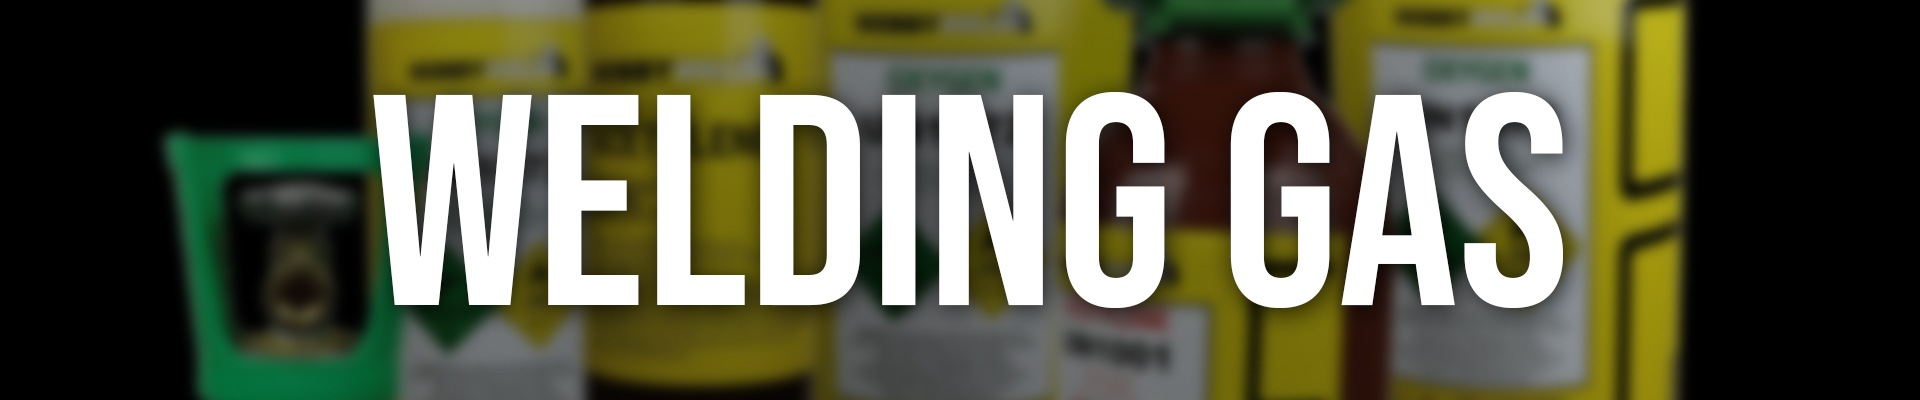 Welding Gas Banner